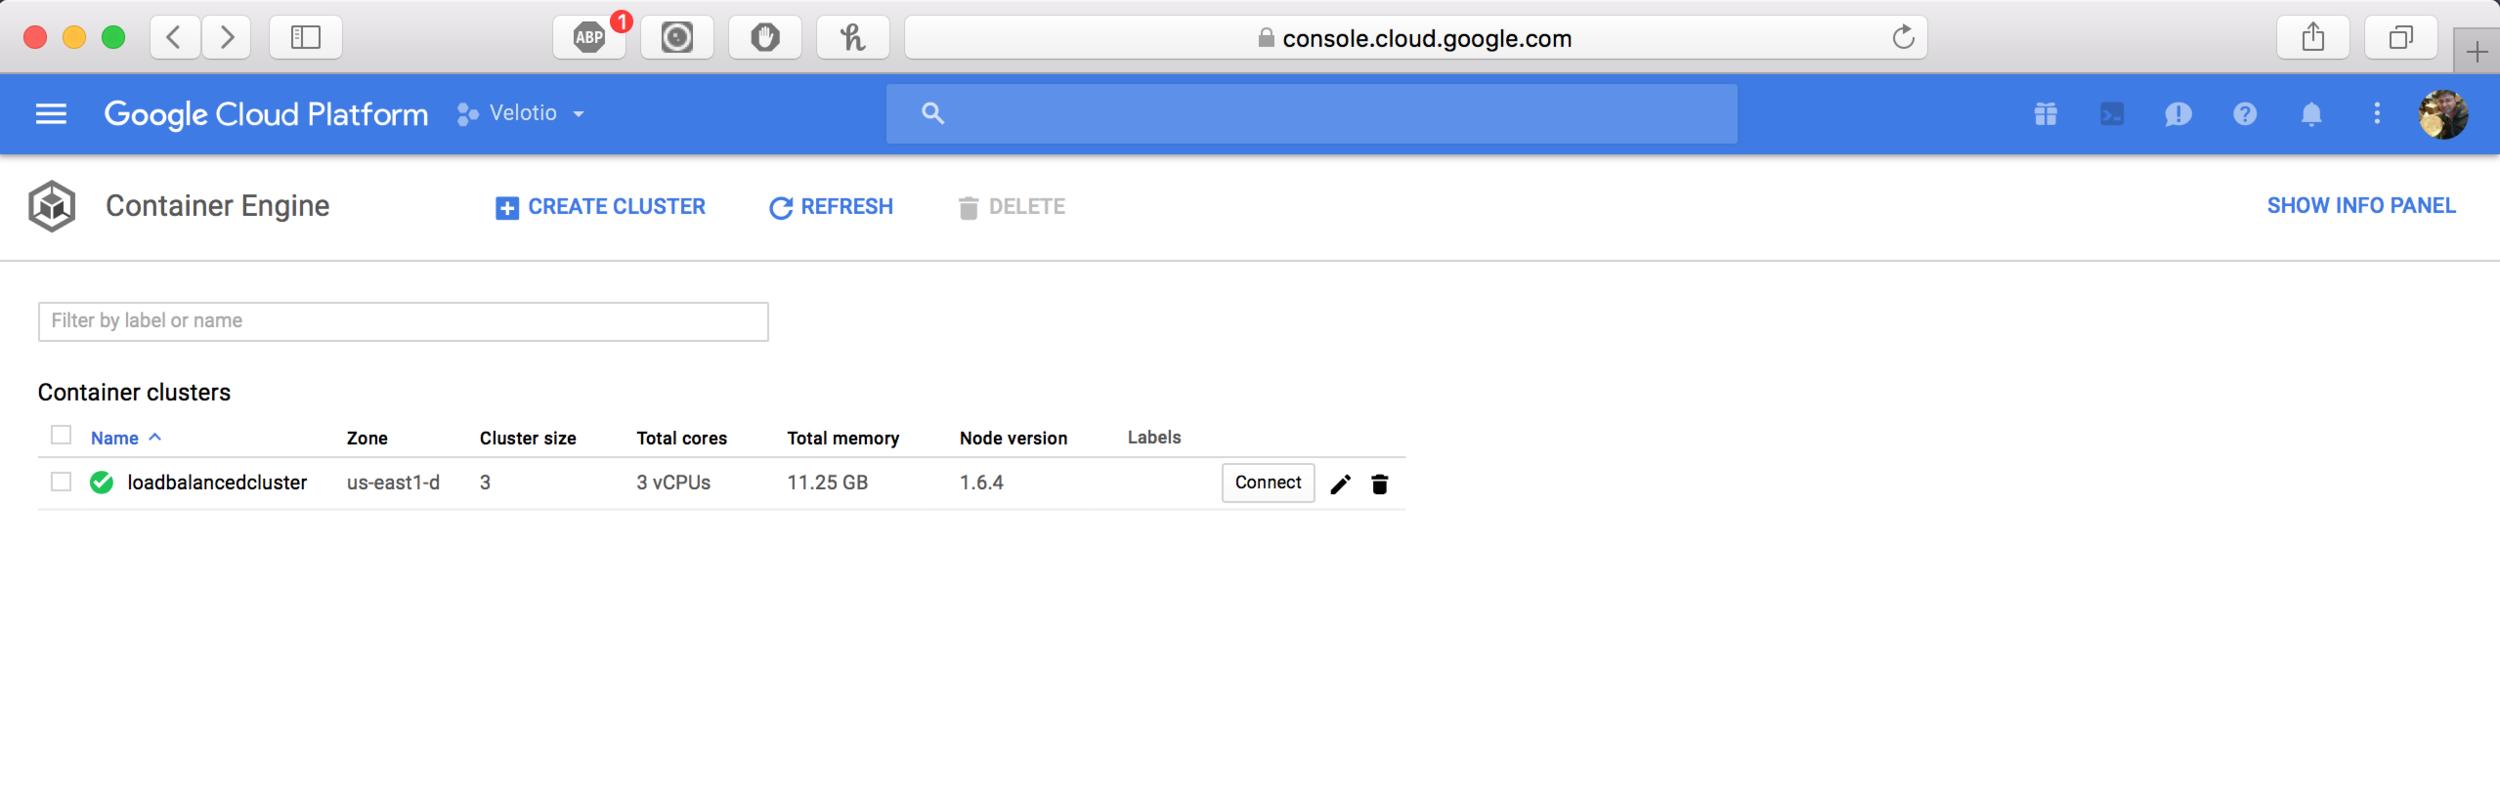 Google Cloud Platform Setup